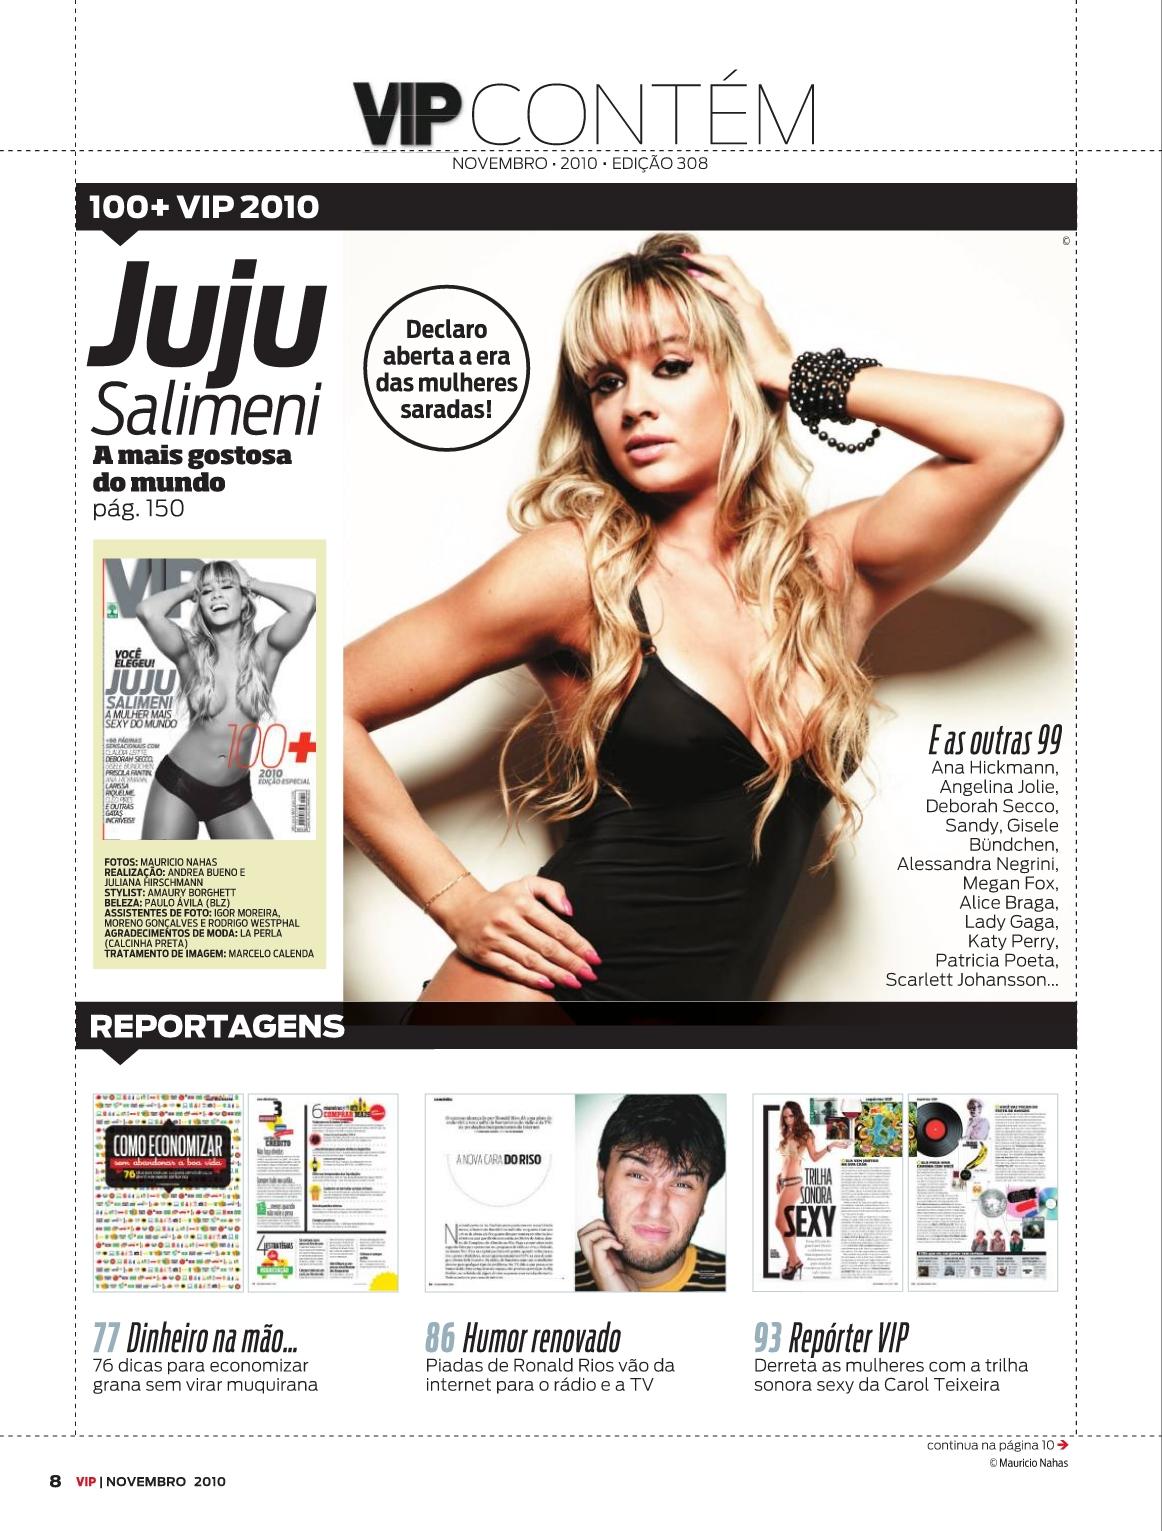 08627_Juliana_Salimeni_Revista_VIP_Noviembre_2010__BlogVen.net__2_123_562lo.jpg